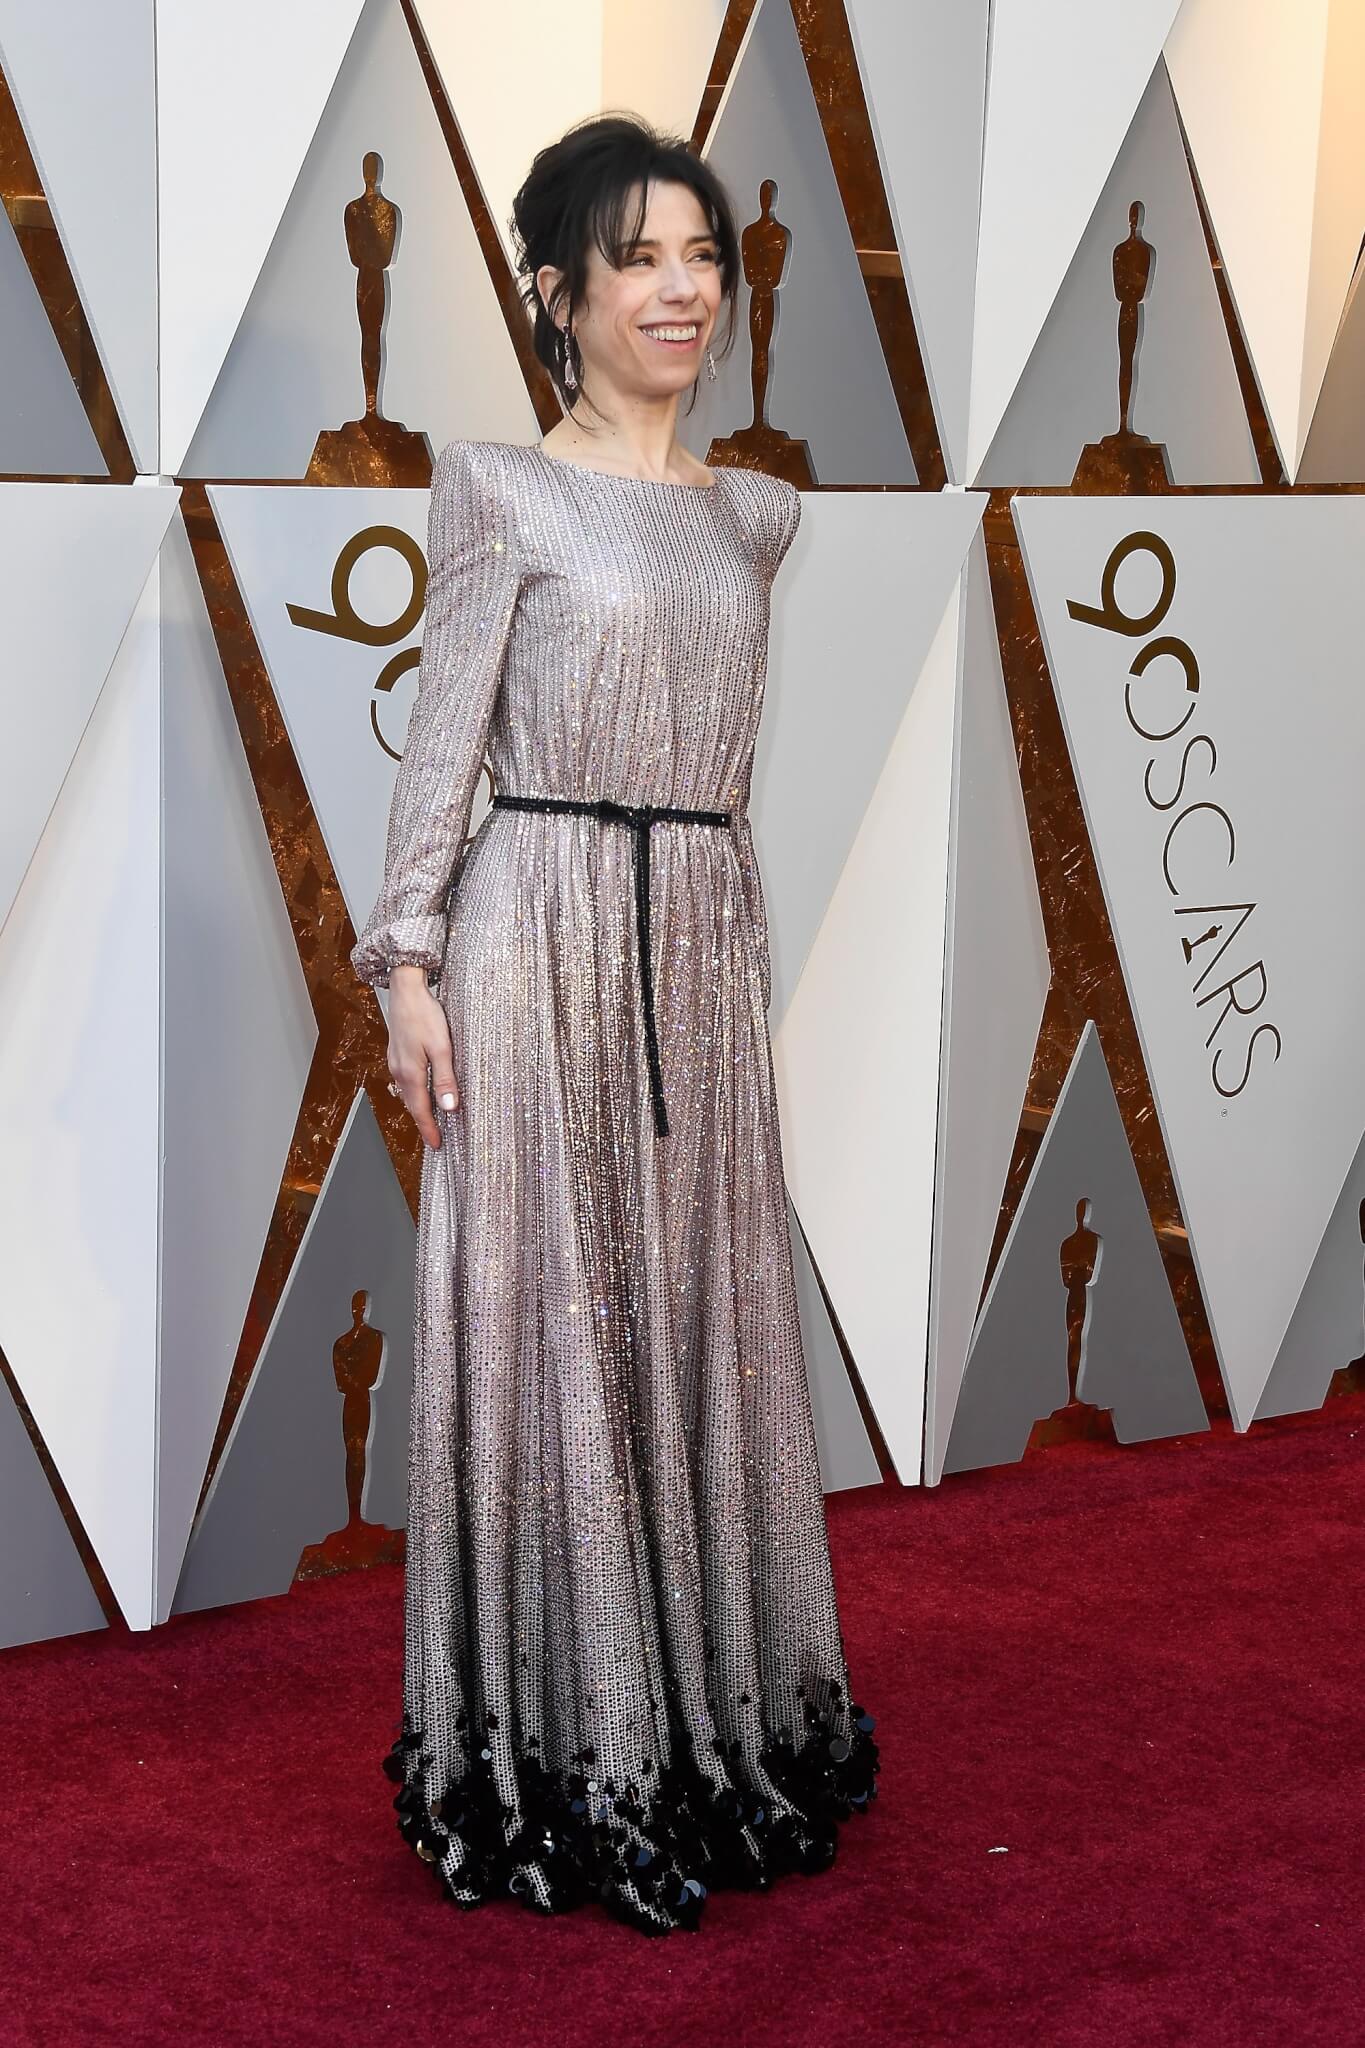 Oscars 2018 - Sally Hawkins